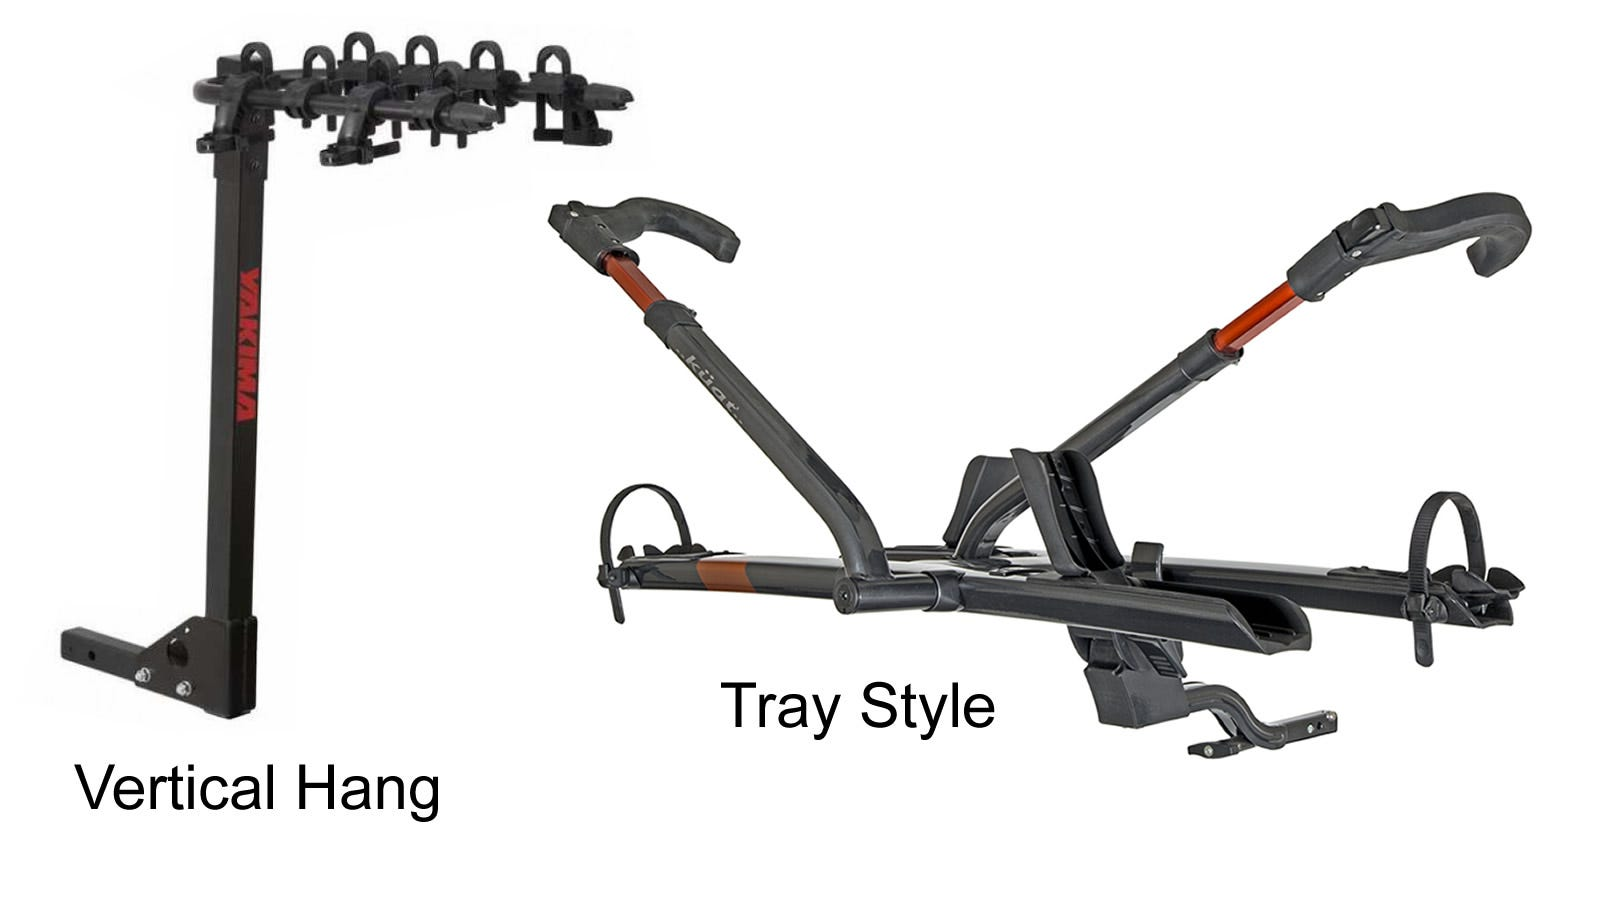 vertical hang and tray mount hitch mount car bike racks